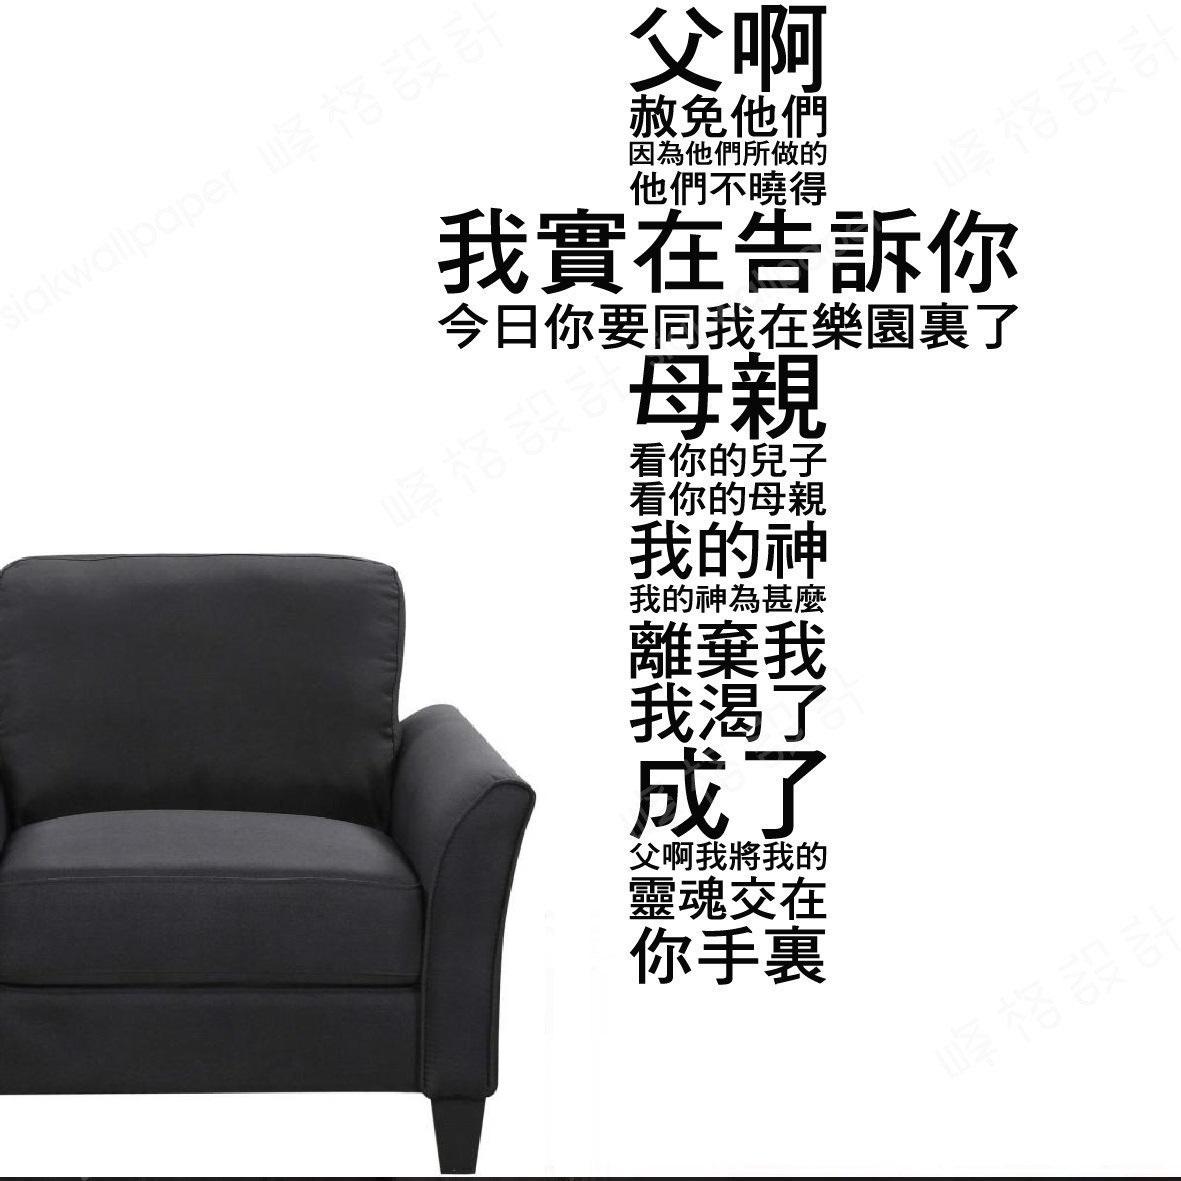 7 words of cross sofa